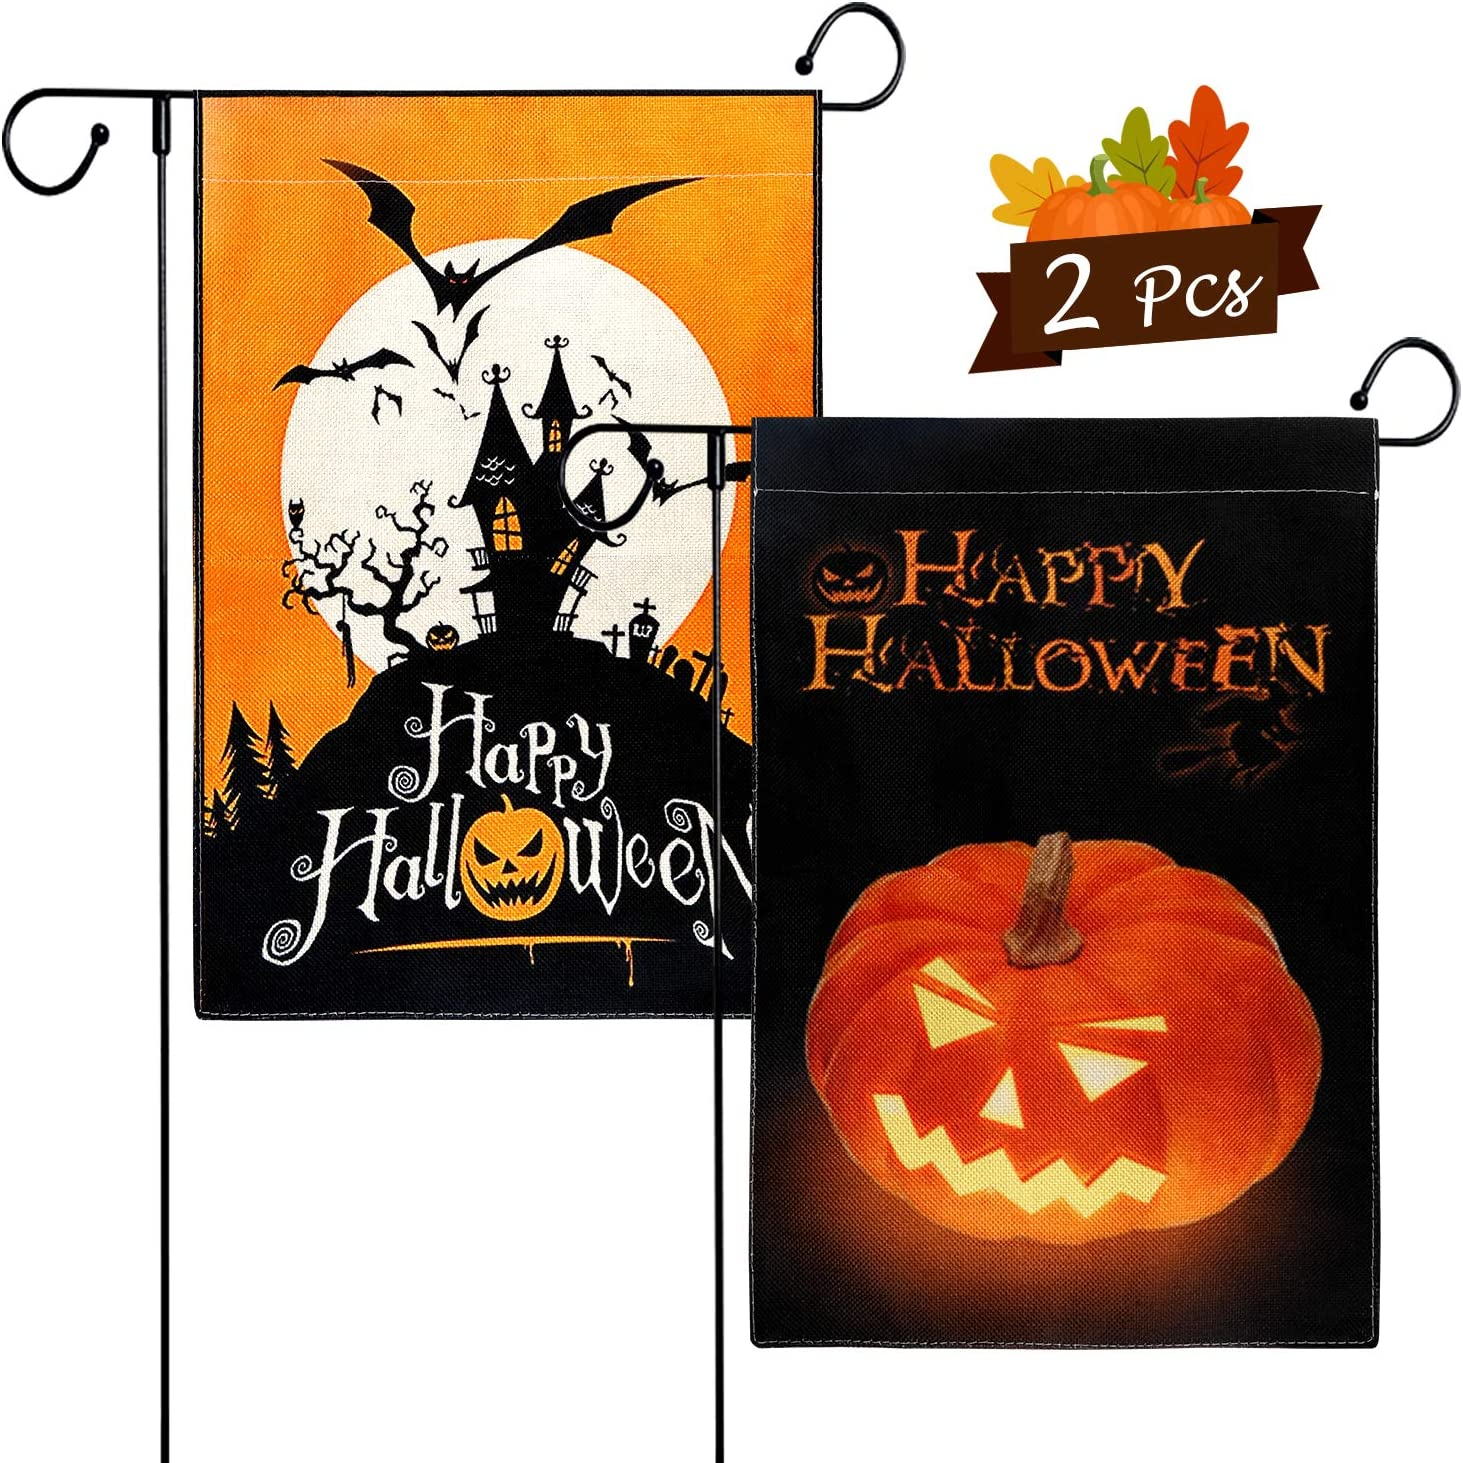 Amazon Com Okrostoy 2 Pcs Happy Halloween Garden Flag Burlap Scary Pumpkin Castle Spooky Bats Double Sided Print Garden Yard Flag For Home Decor 12 X 18 Inch 2 Pcs Happy Halloween Flags